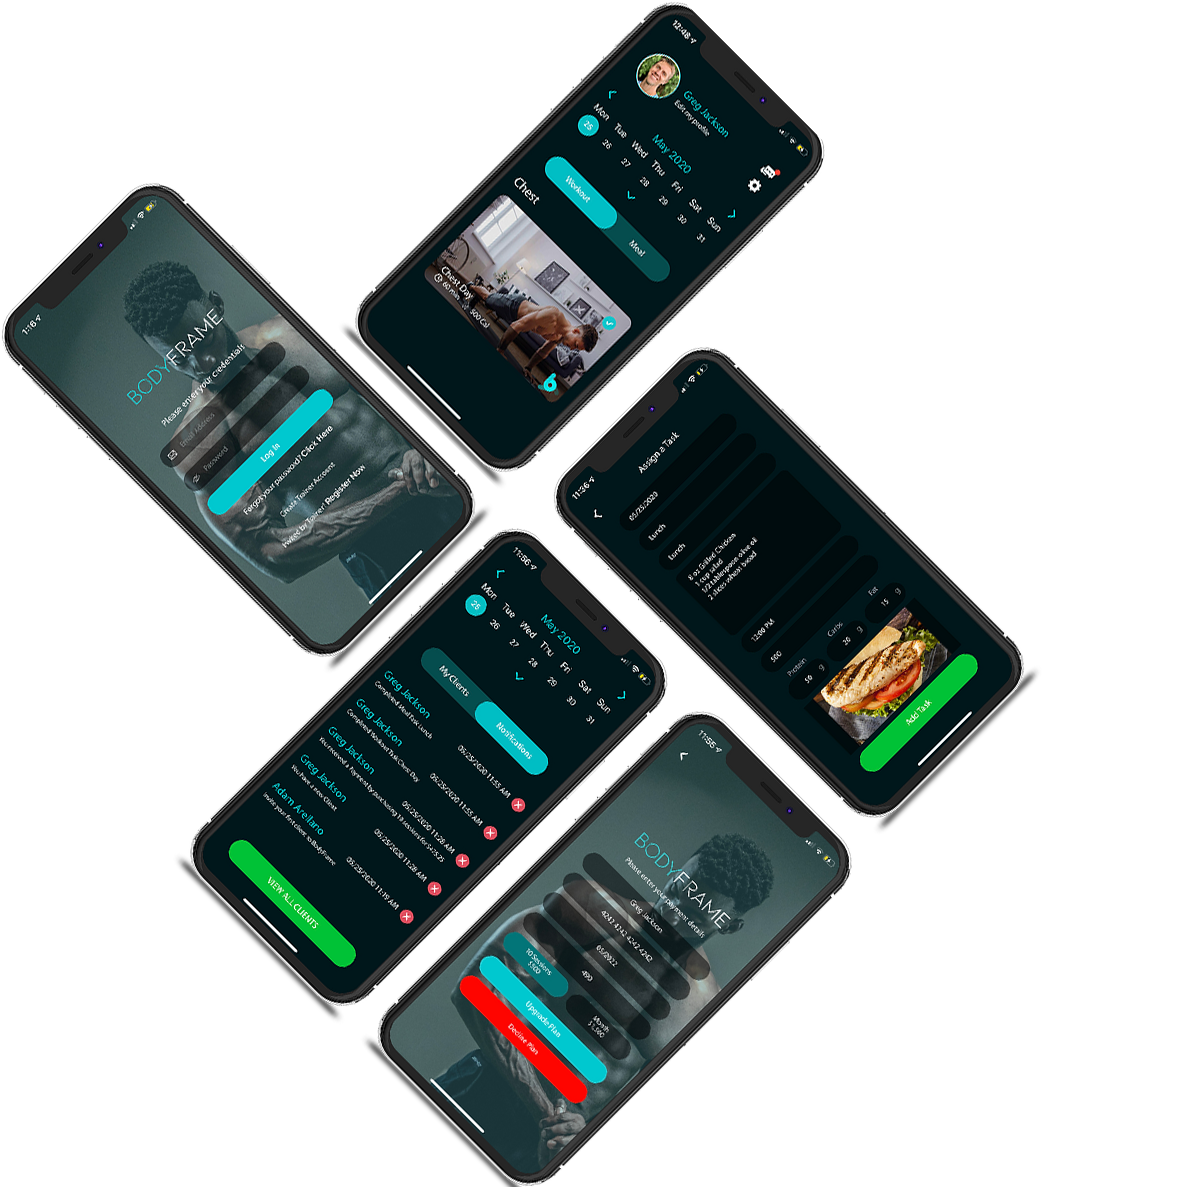 bodyframe app on screen